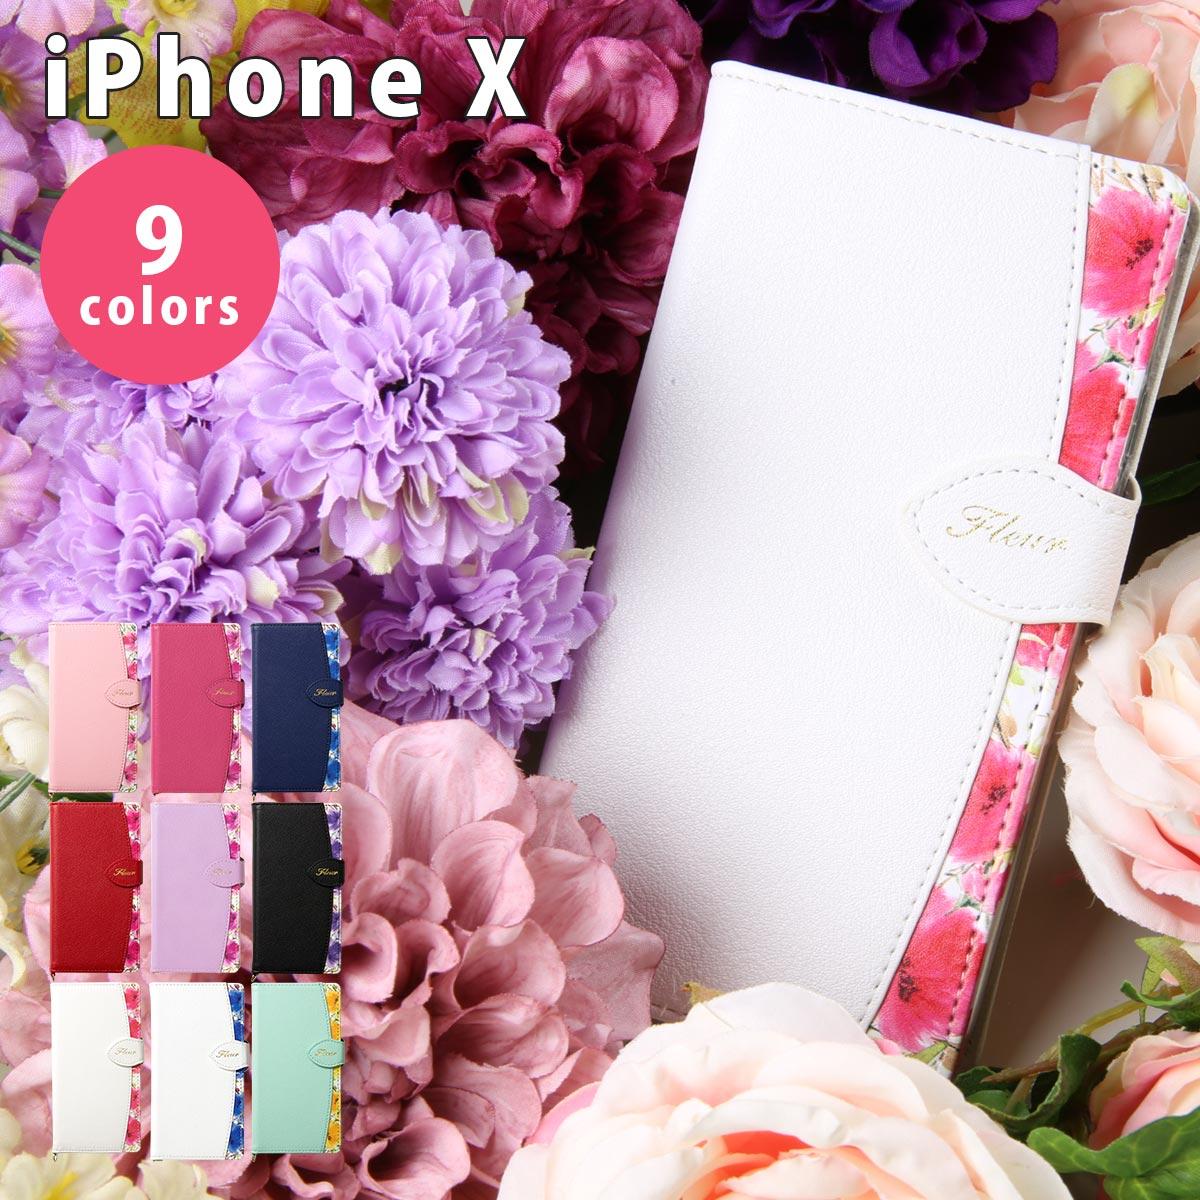 iPhone X ケース 手帳型 スマホケース スマートフォン おしゃれ アイフォン 大人女子 ナチュラルデザイン NATURAL design FLEUR